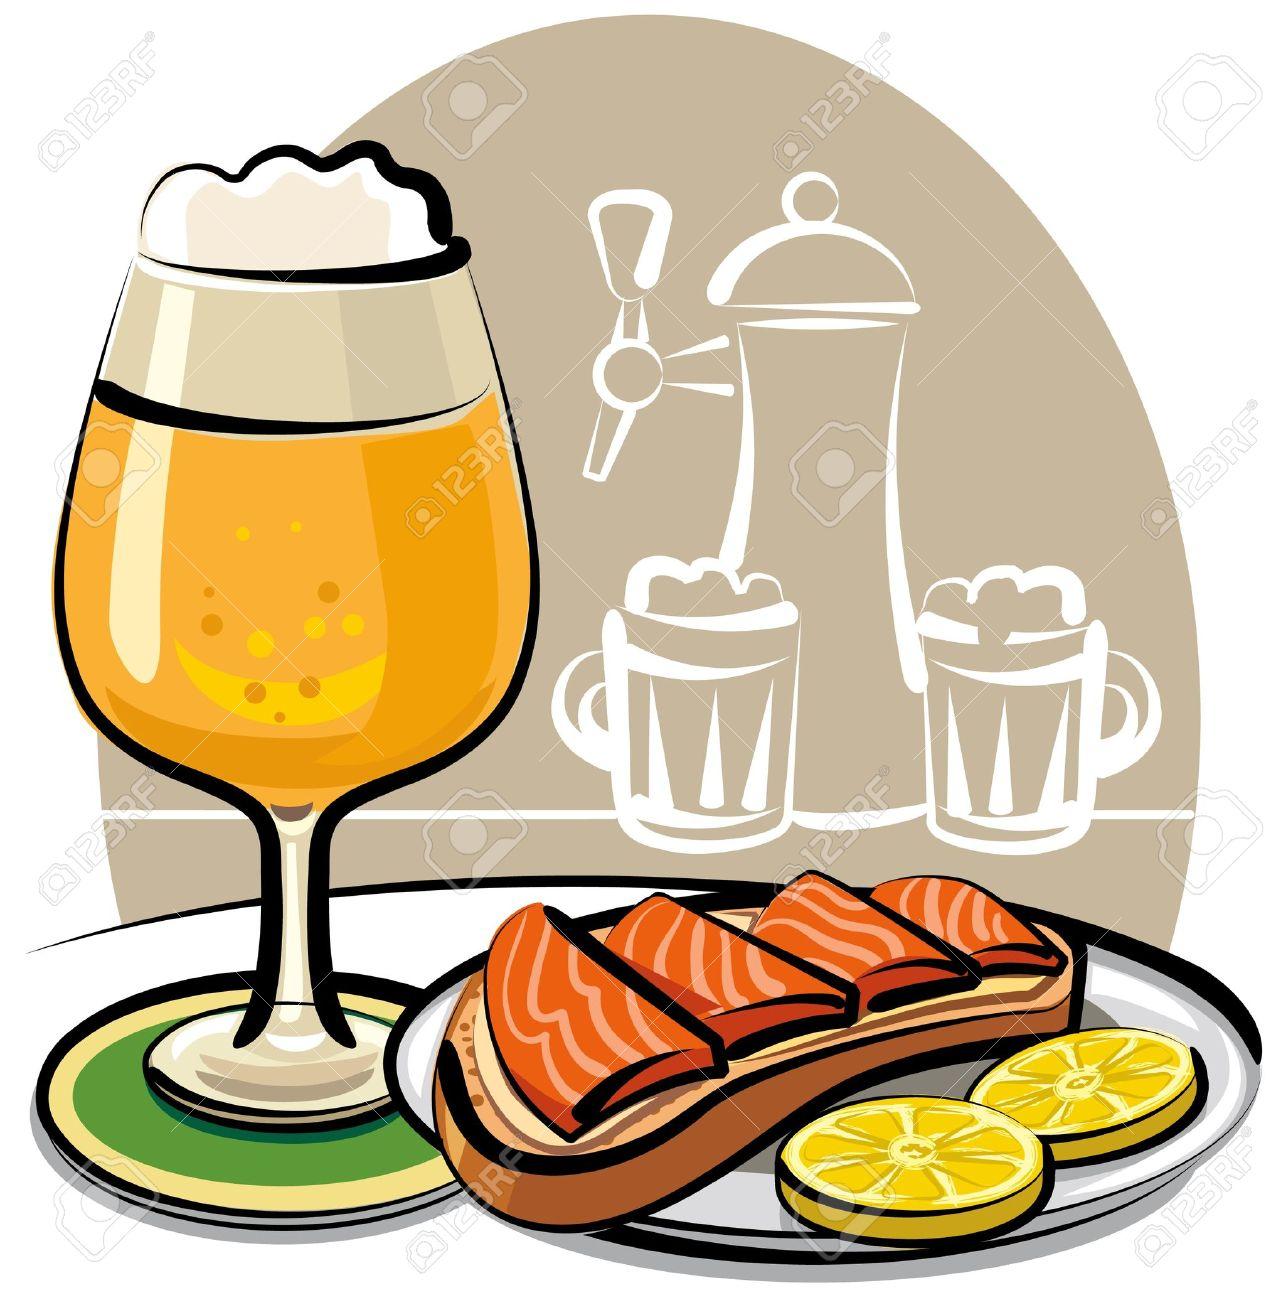 Beer clipart food, Beer food Transparent FREE for download.